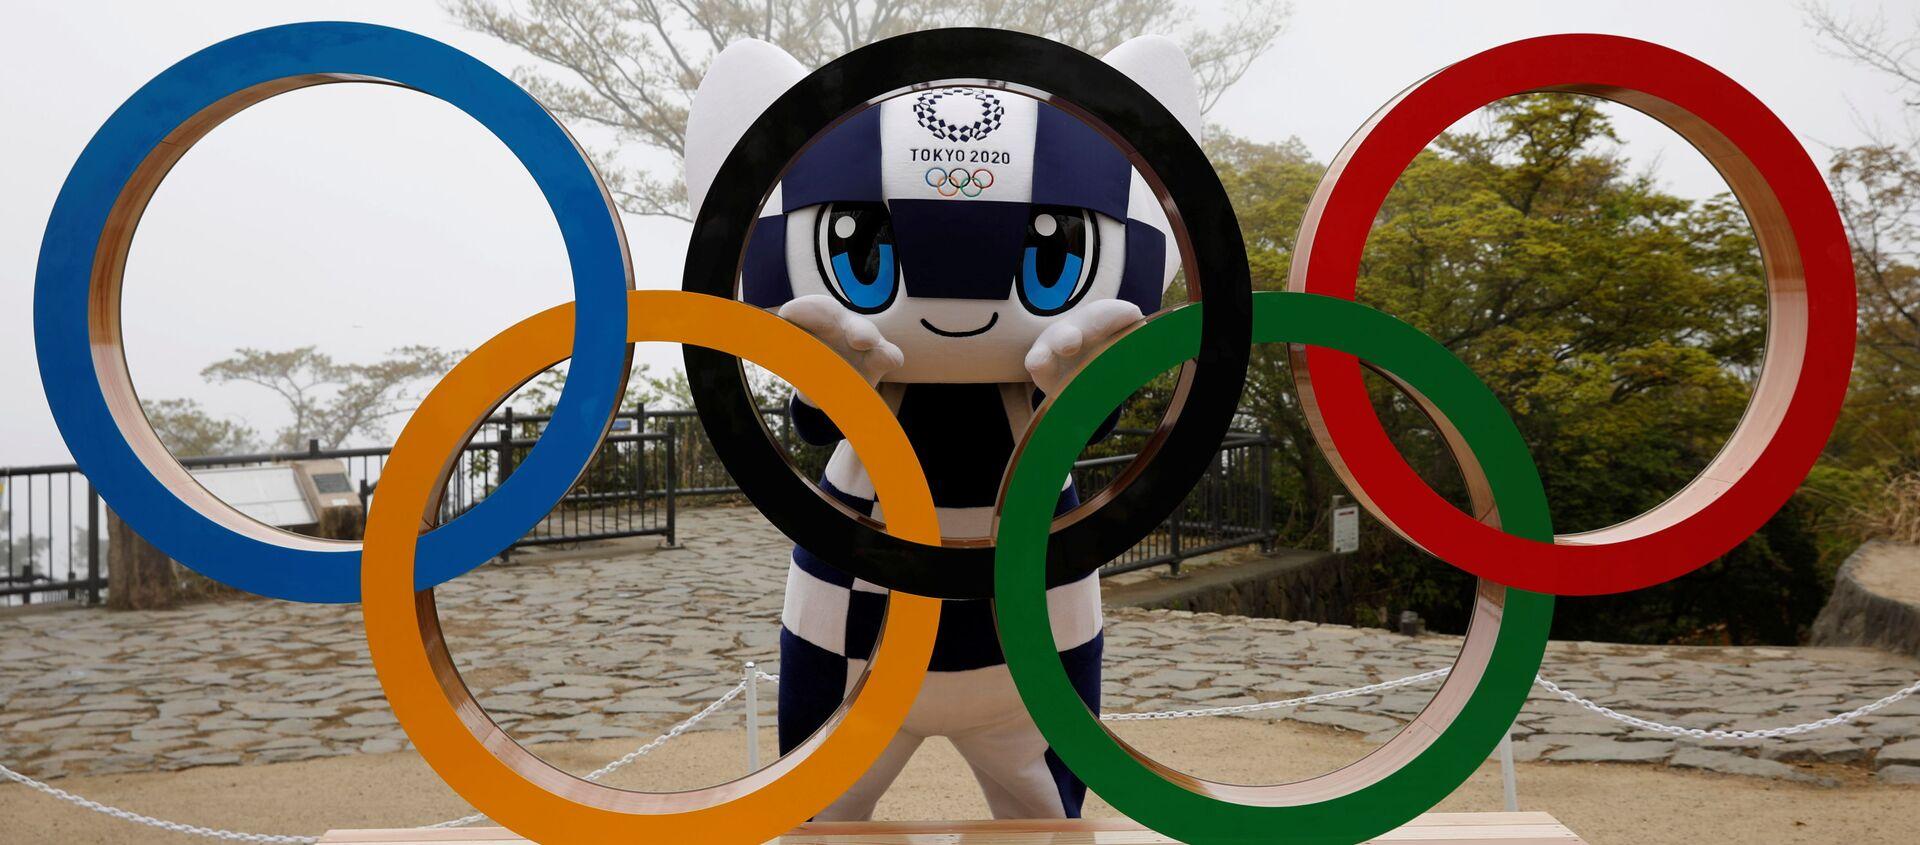 Талисман Олимпийских игр 2020 года в Токио Мирайтова - Sputnik 日本, 1920, 17.05.2021